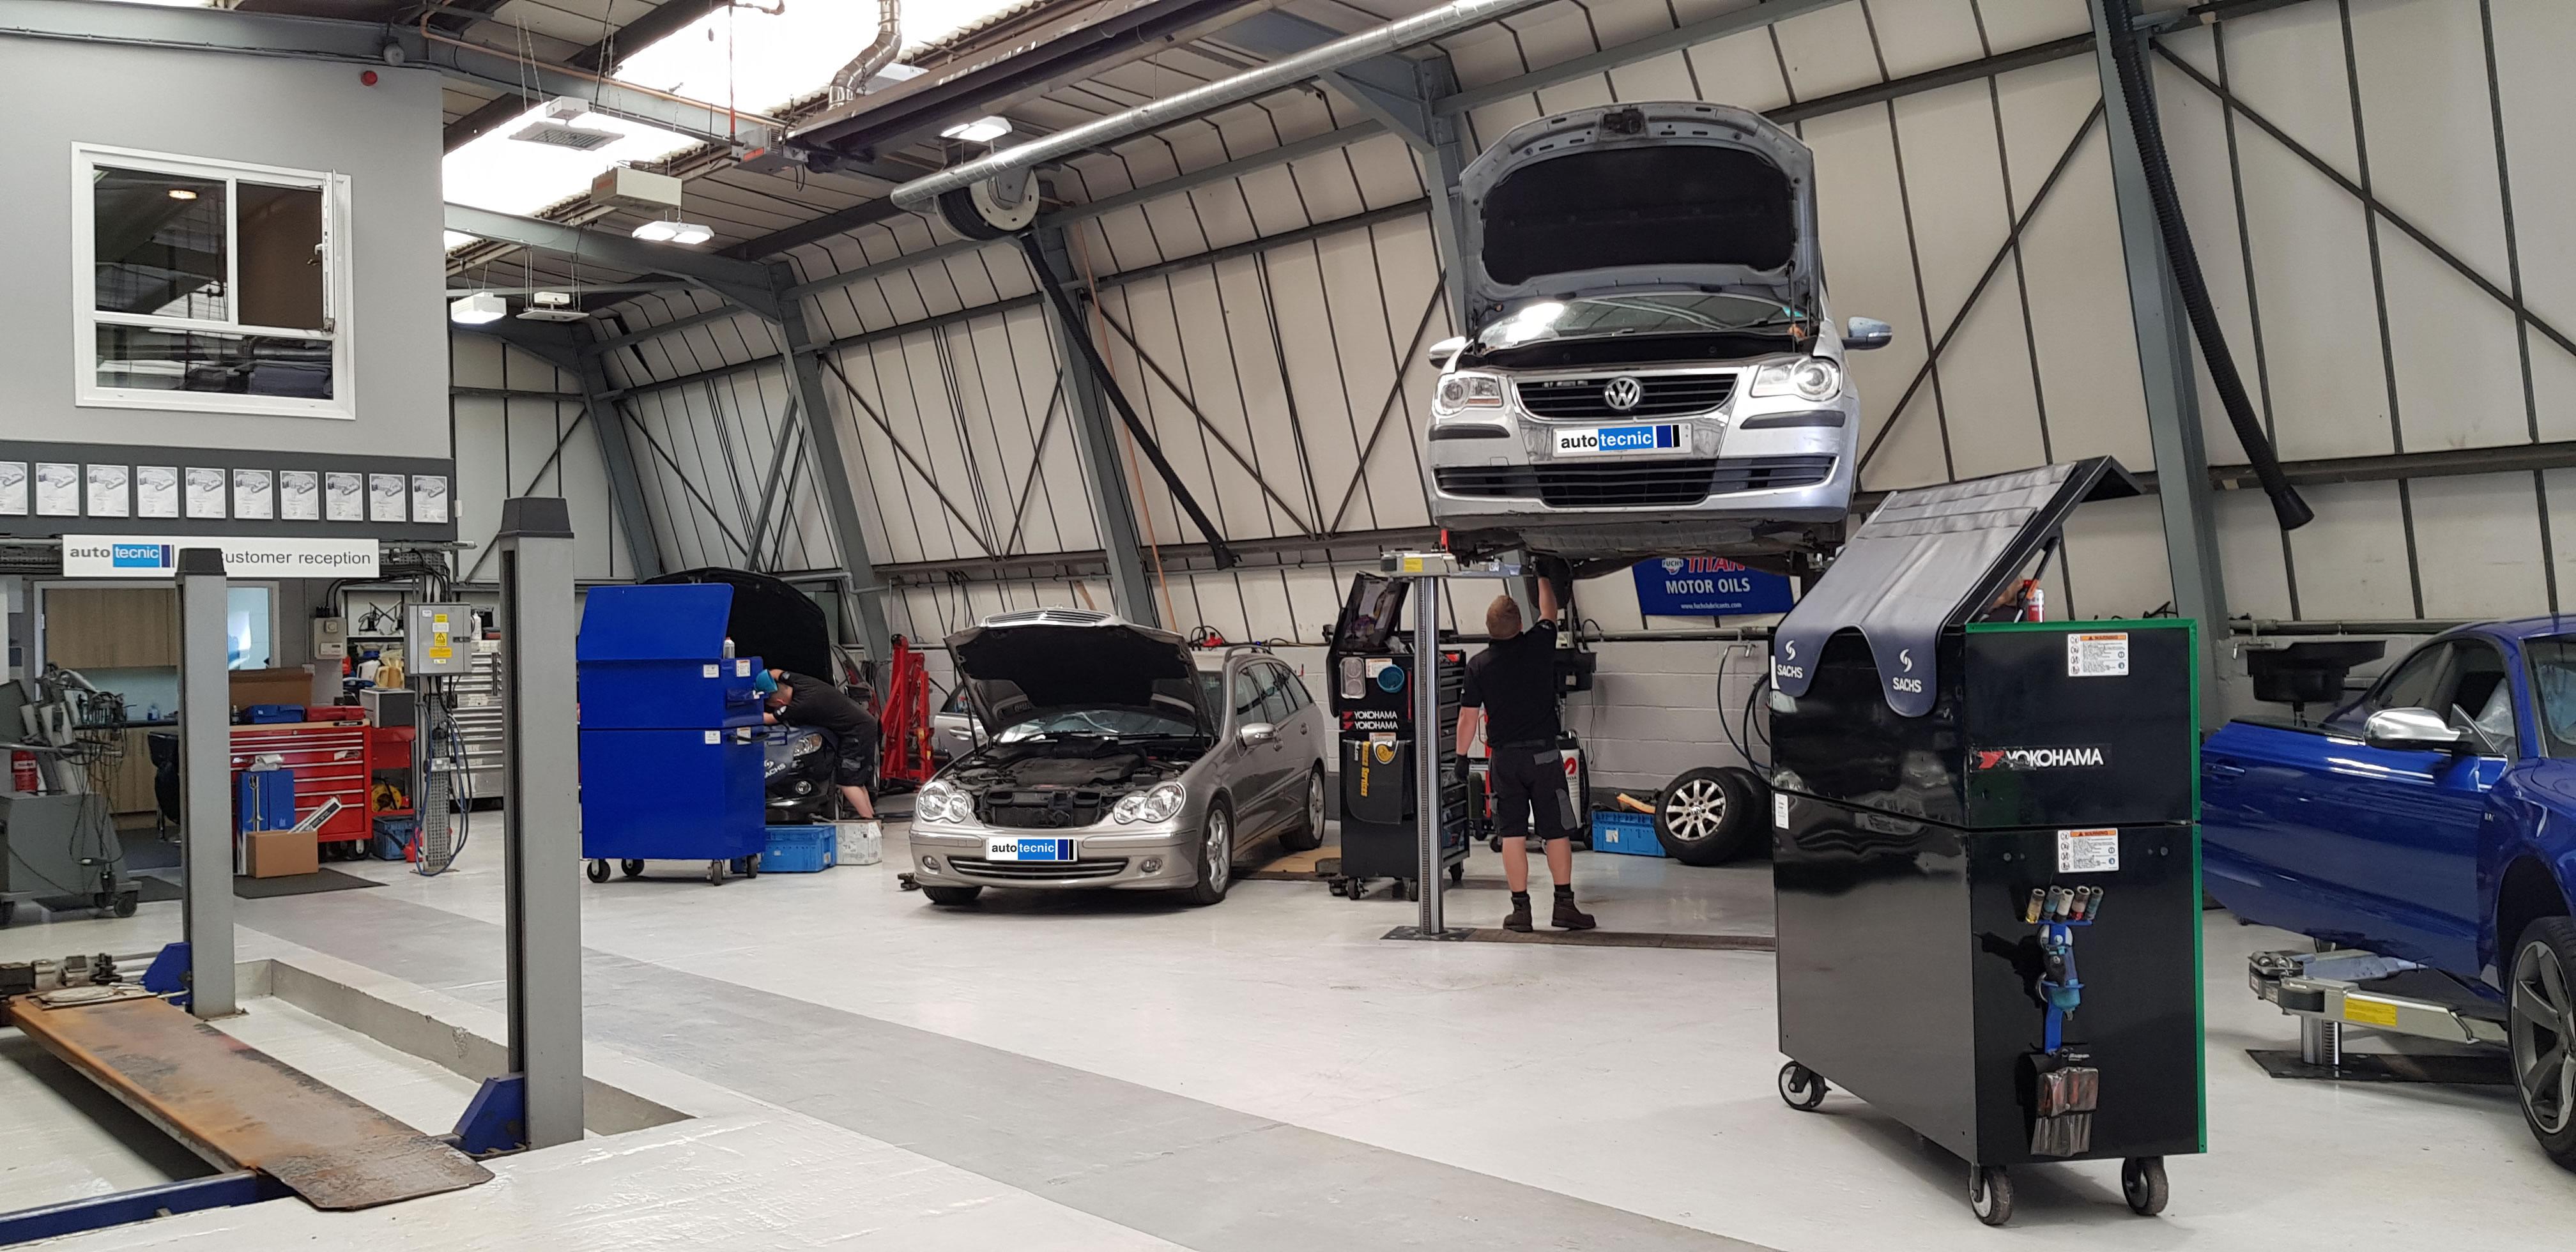 autotecnic - workshop - mercedes benz e class - vw touran